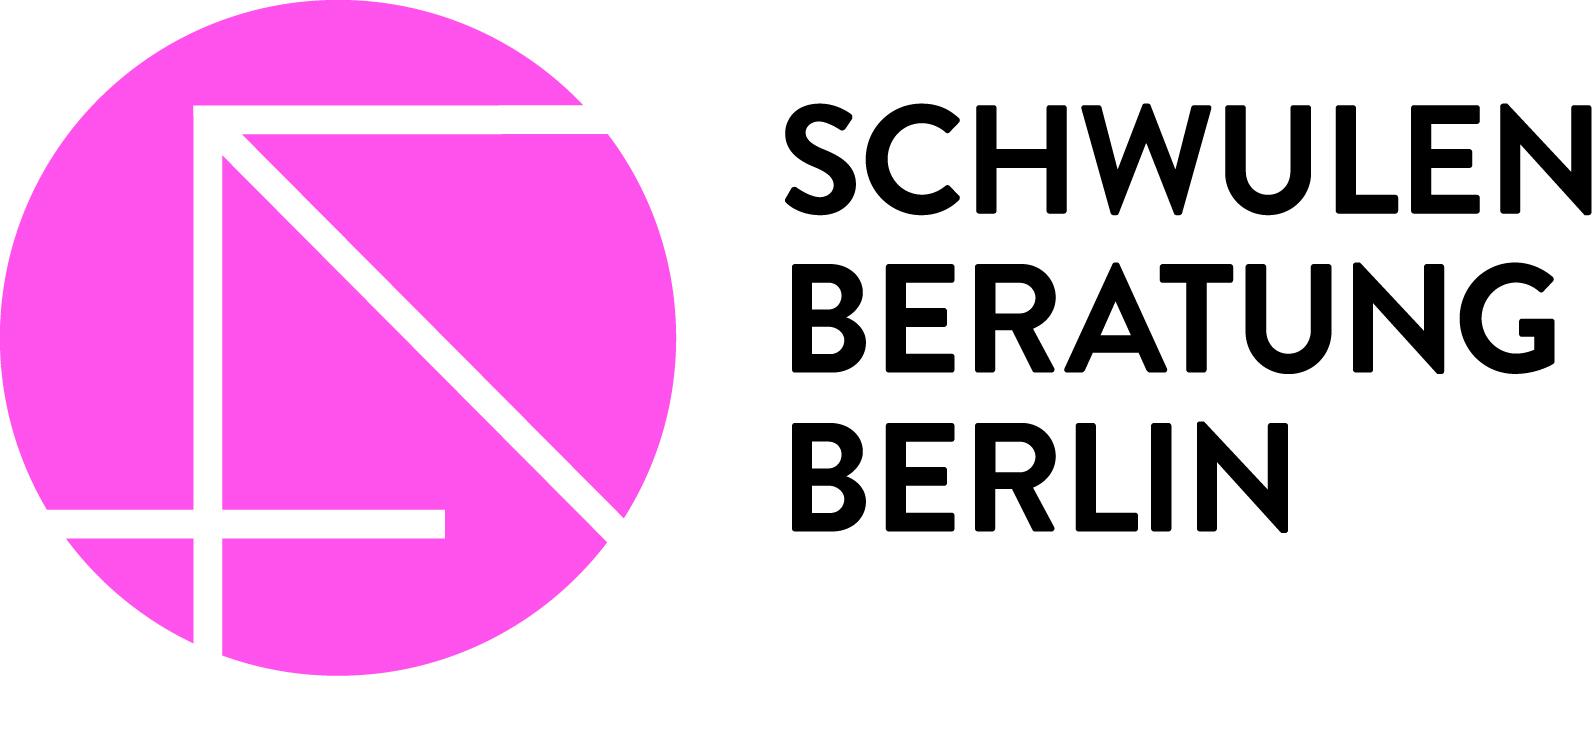 Zur Website der Schwulenberatung Berlin